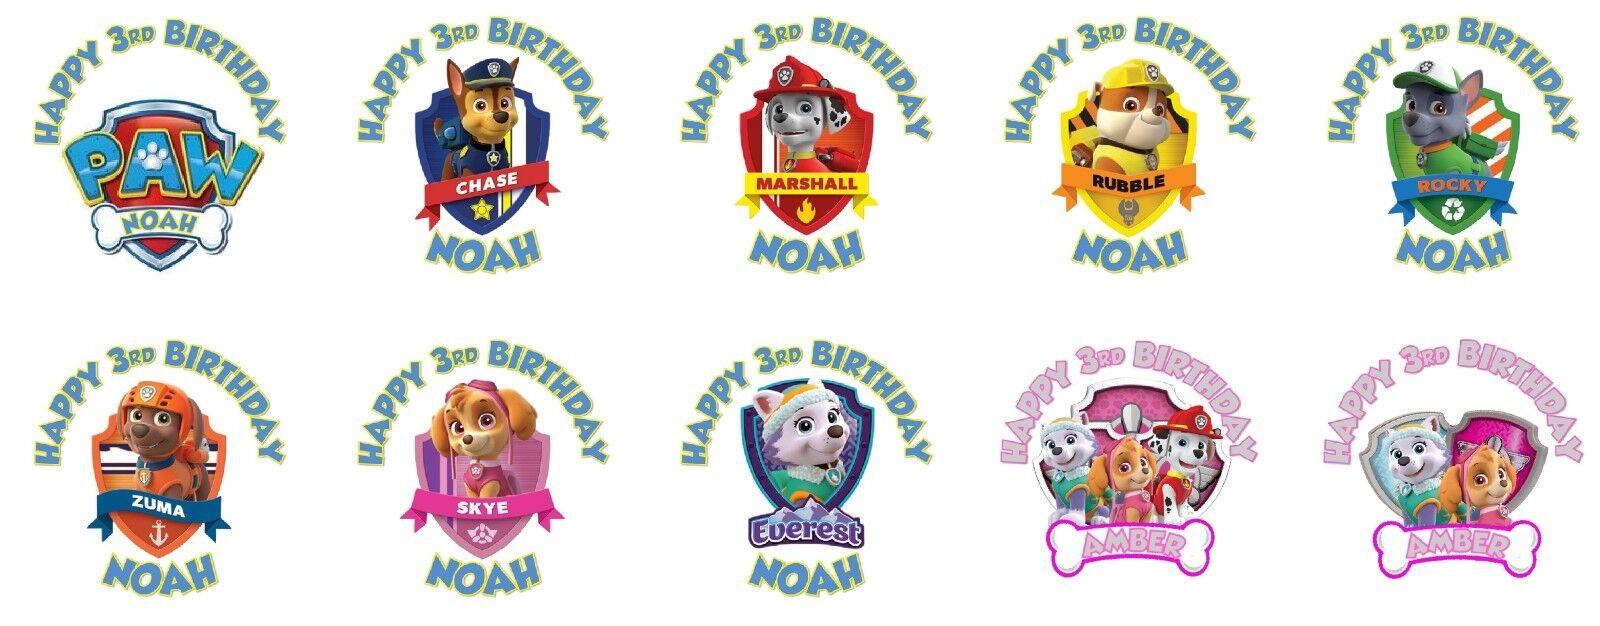 10 bolsas Paw Patrol sticker-serie 3-listo para uso 2019-1 album